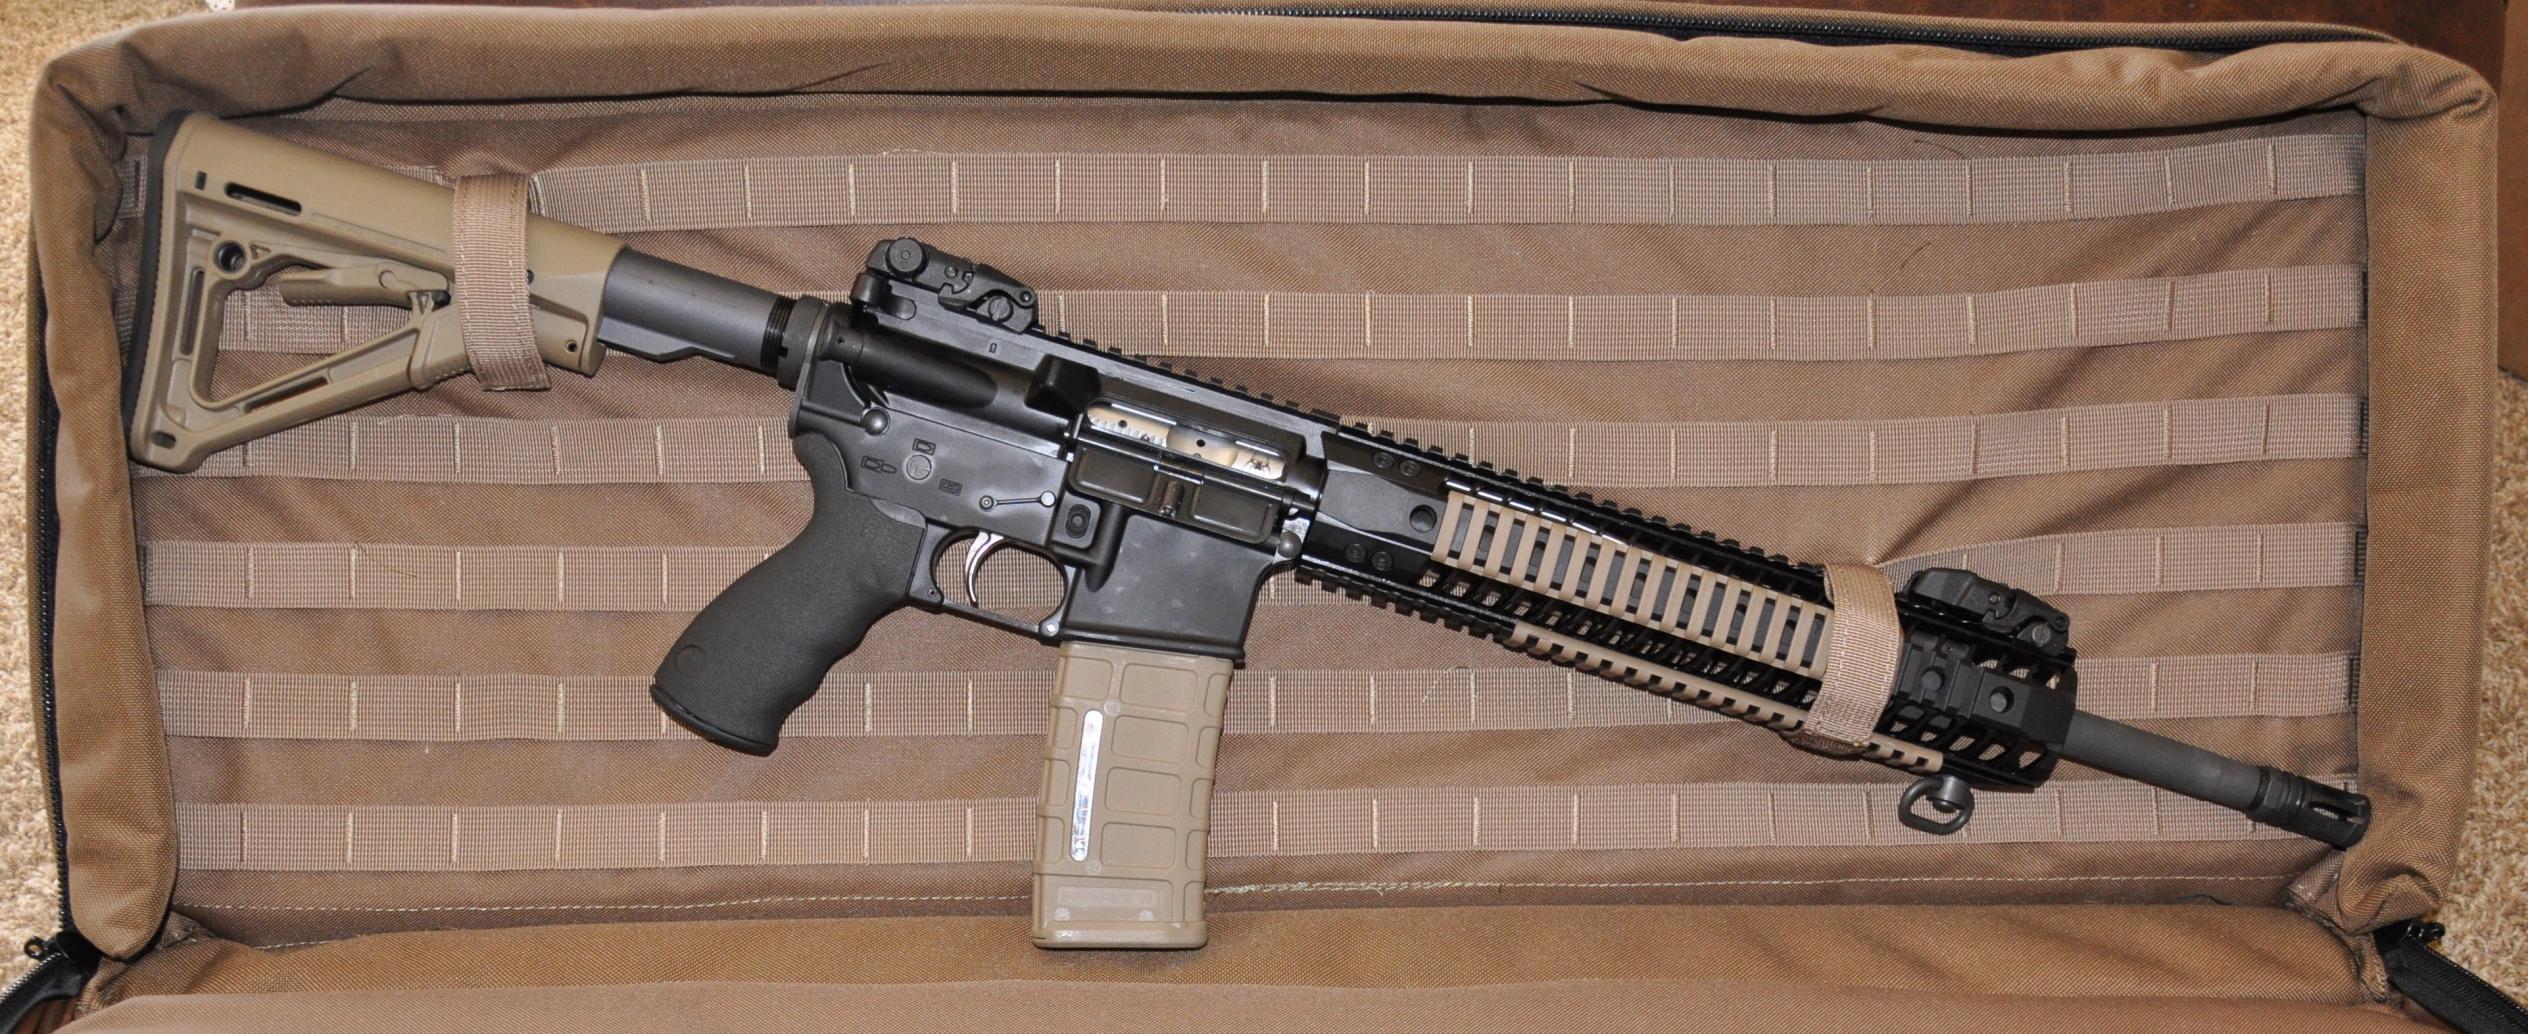 New Spike's AR-15 (a little long - PICS!)-spikes4.jpg